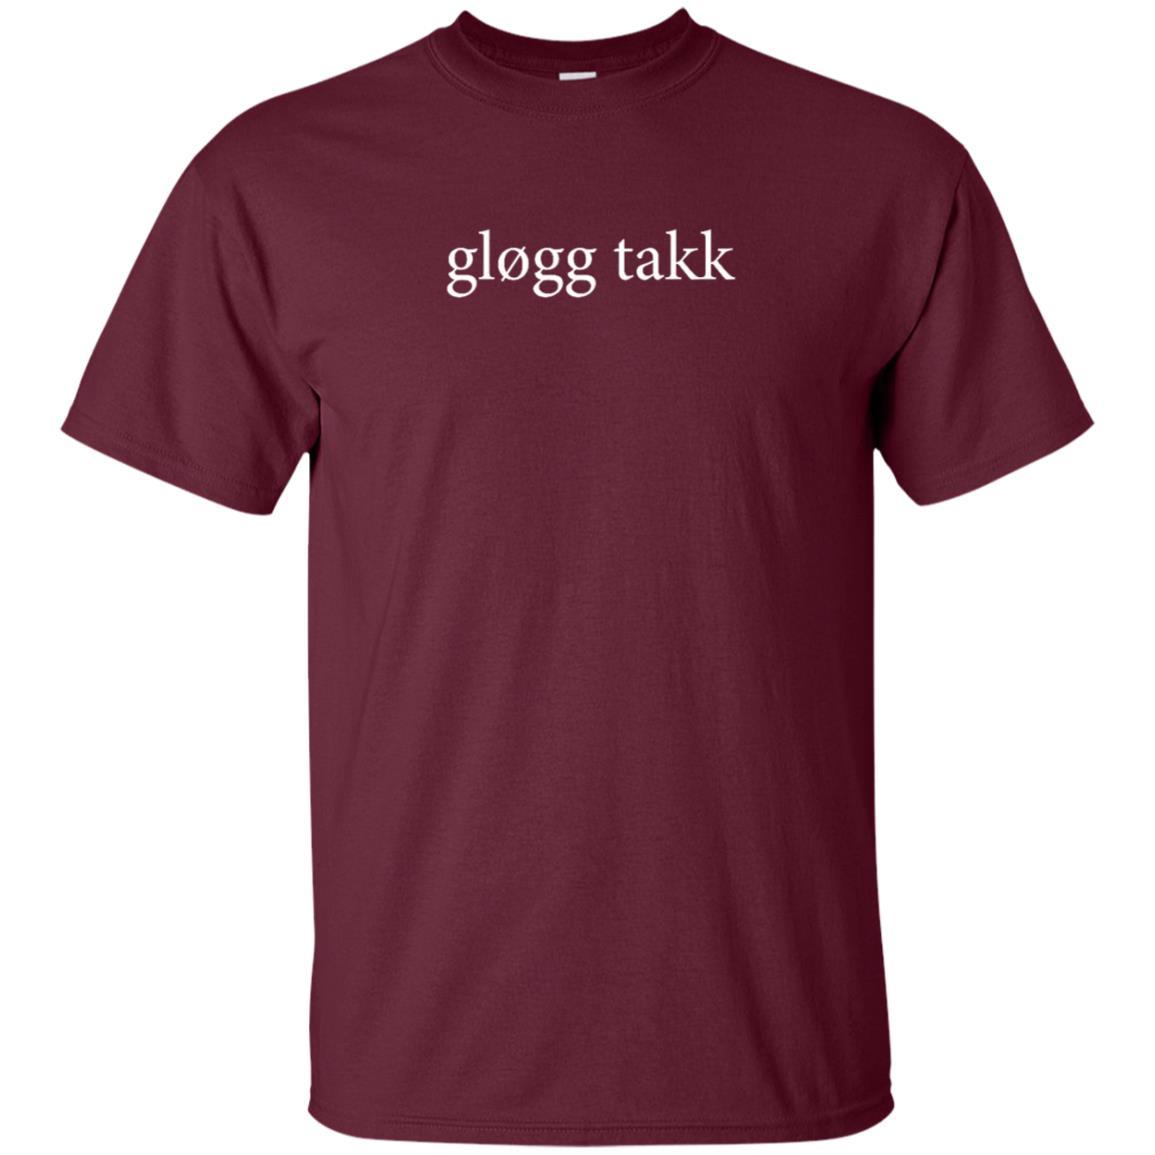 Glogg Takk Please Language Norwegian Wine Vacation Unisex Short Sleeve